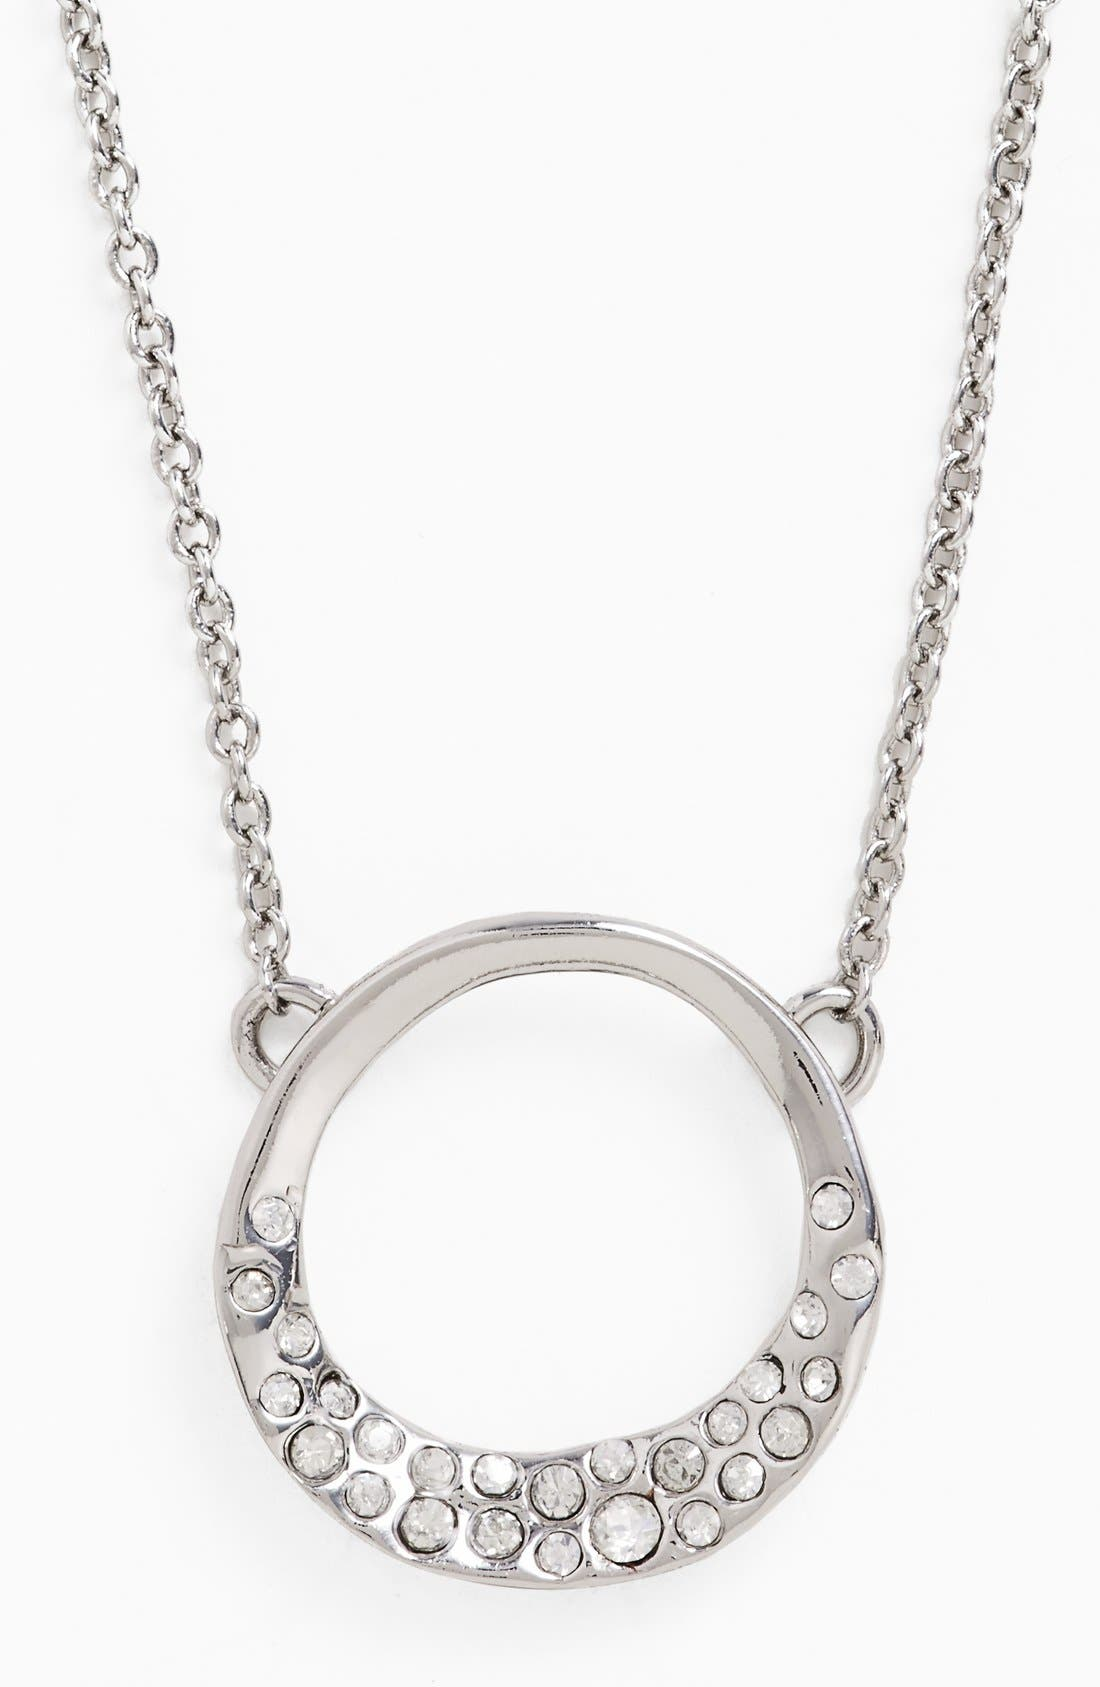 Alternate Image 1 Selected - Alexis Bittar 'Miss Havisham' Pendant Necklace